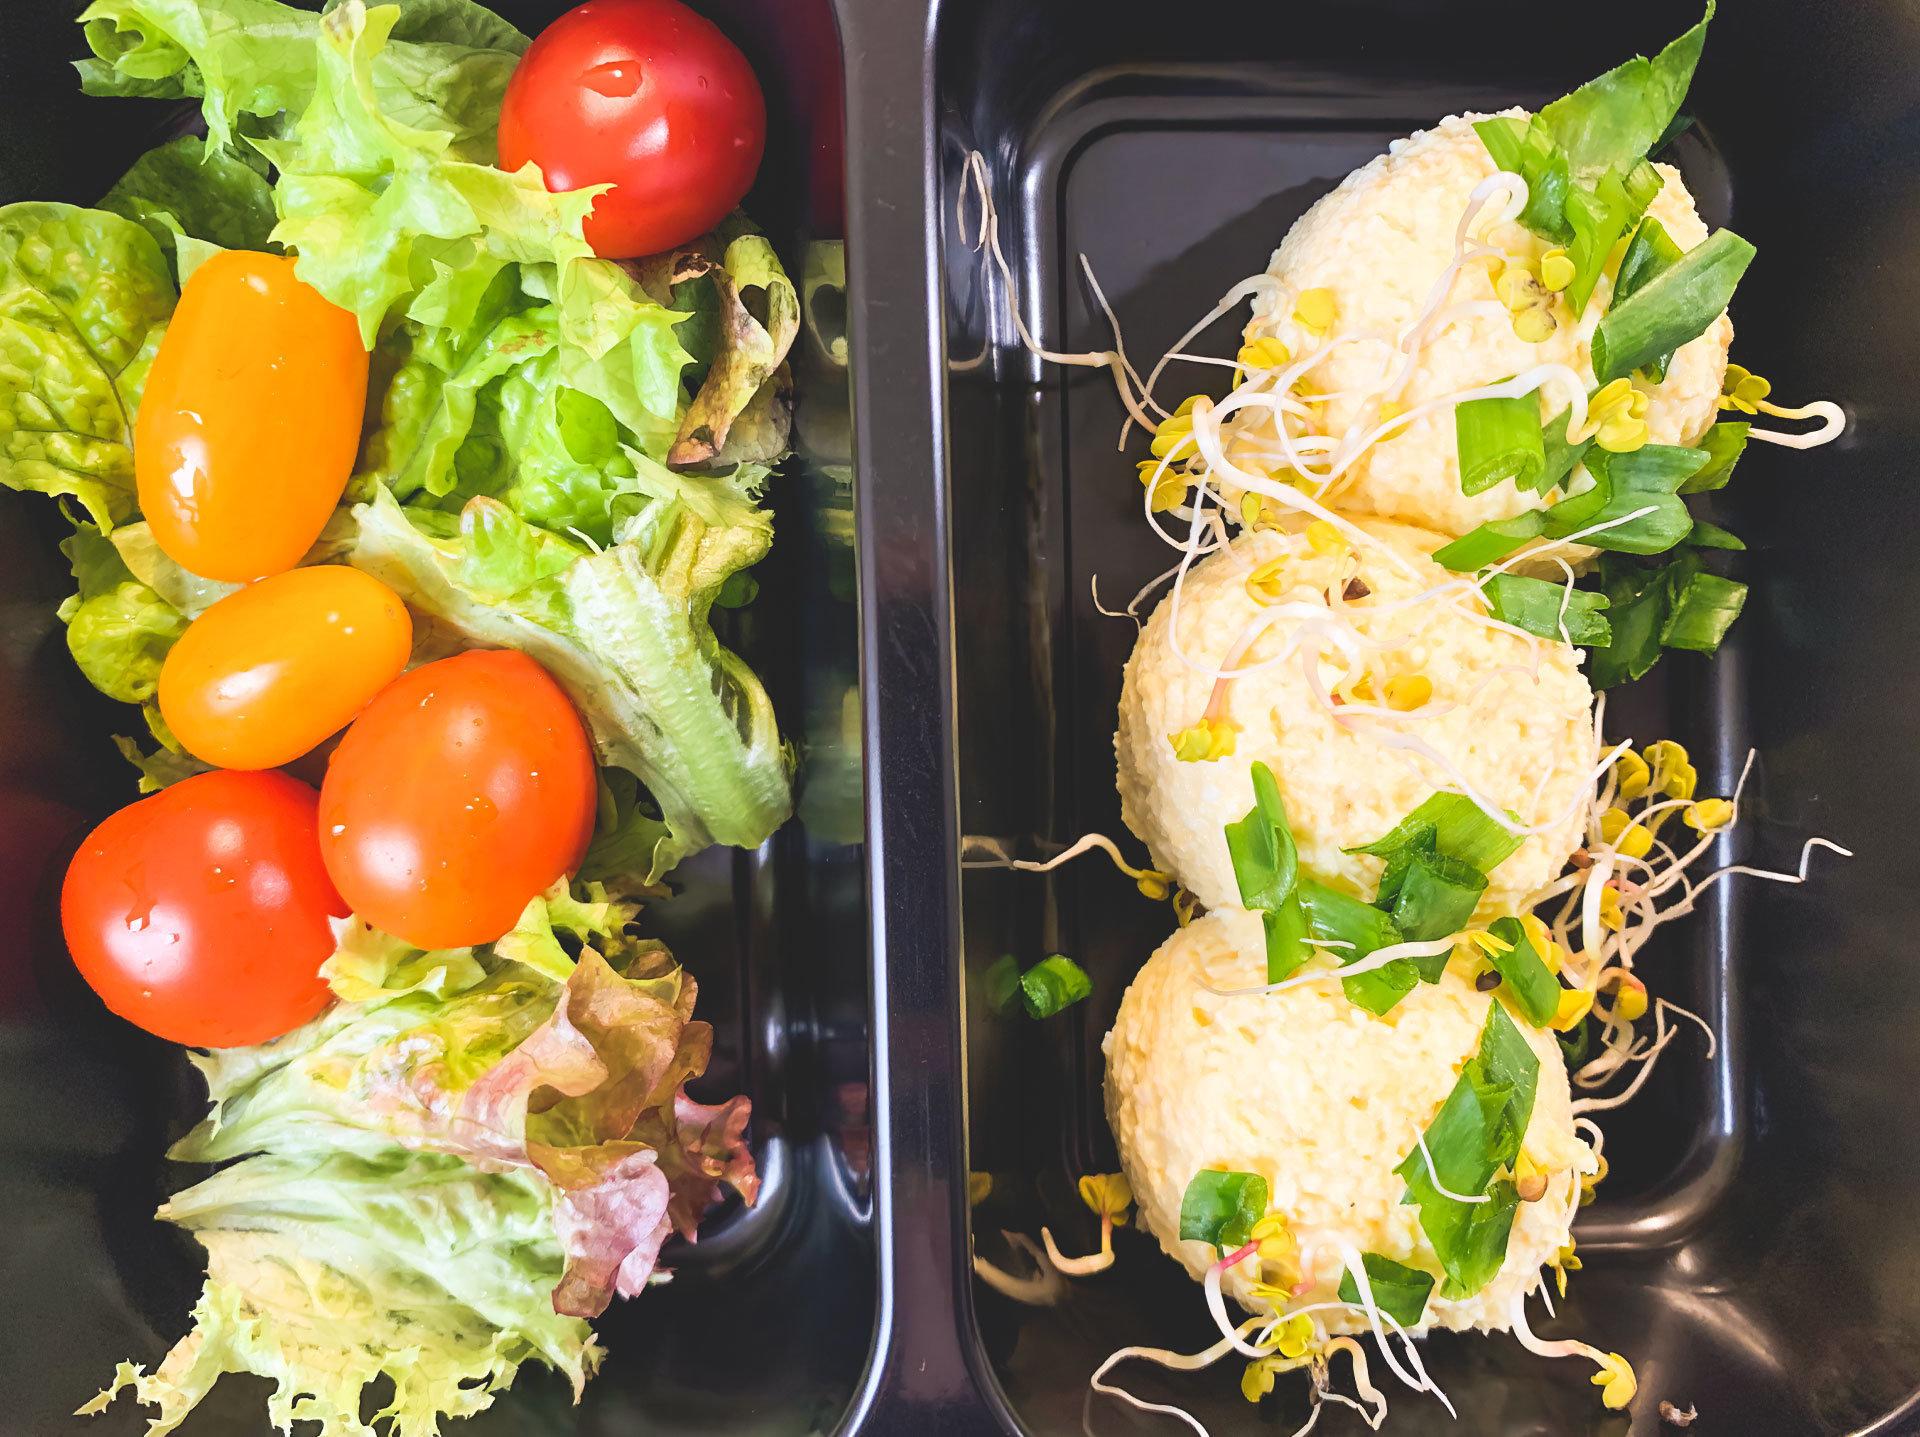 Obrazek Dieta bez glutenu i laktozy na 5 dni 1500 kalorii